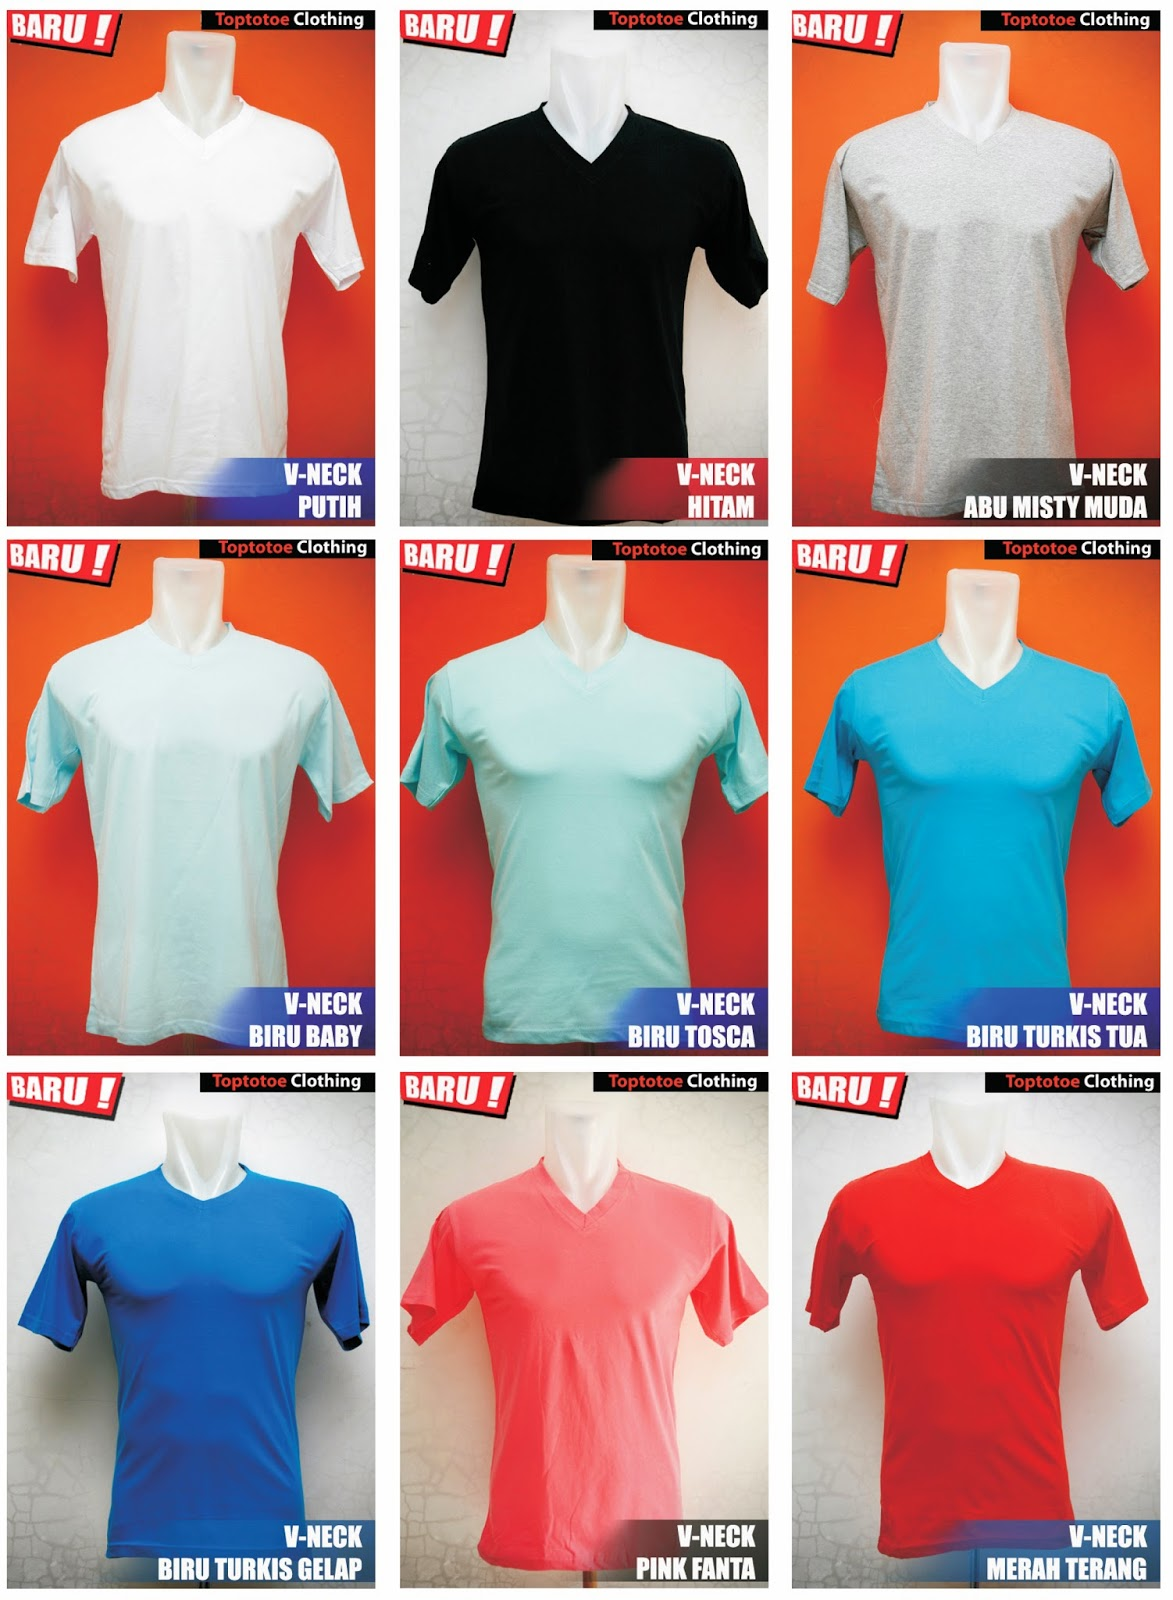 Kaos Polos Vneck Bahan Cotton Combed 30s Toptotoe Clothing Yellow Baby